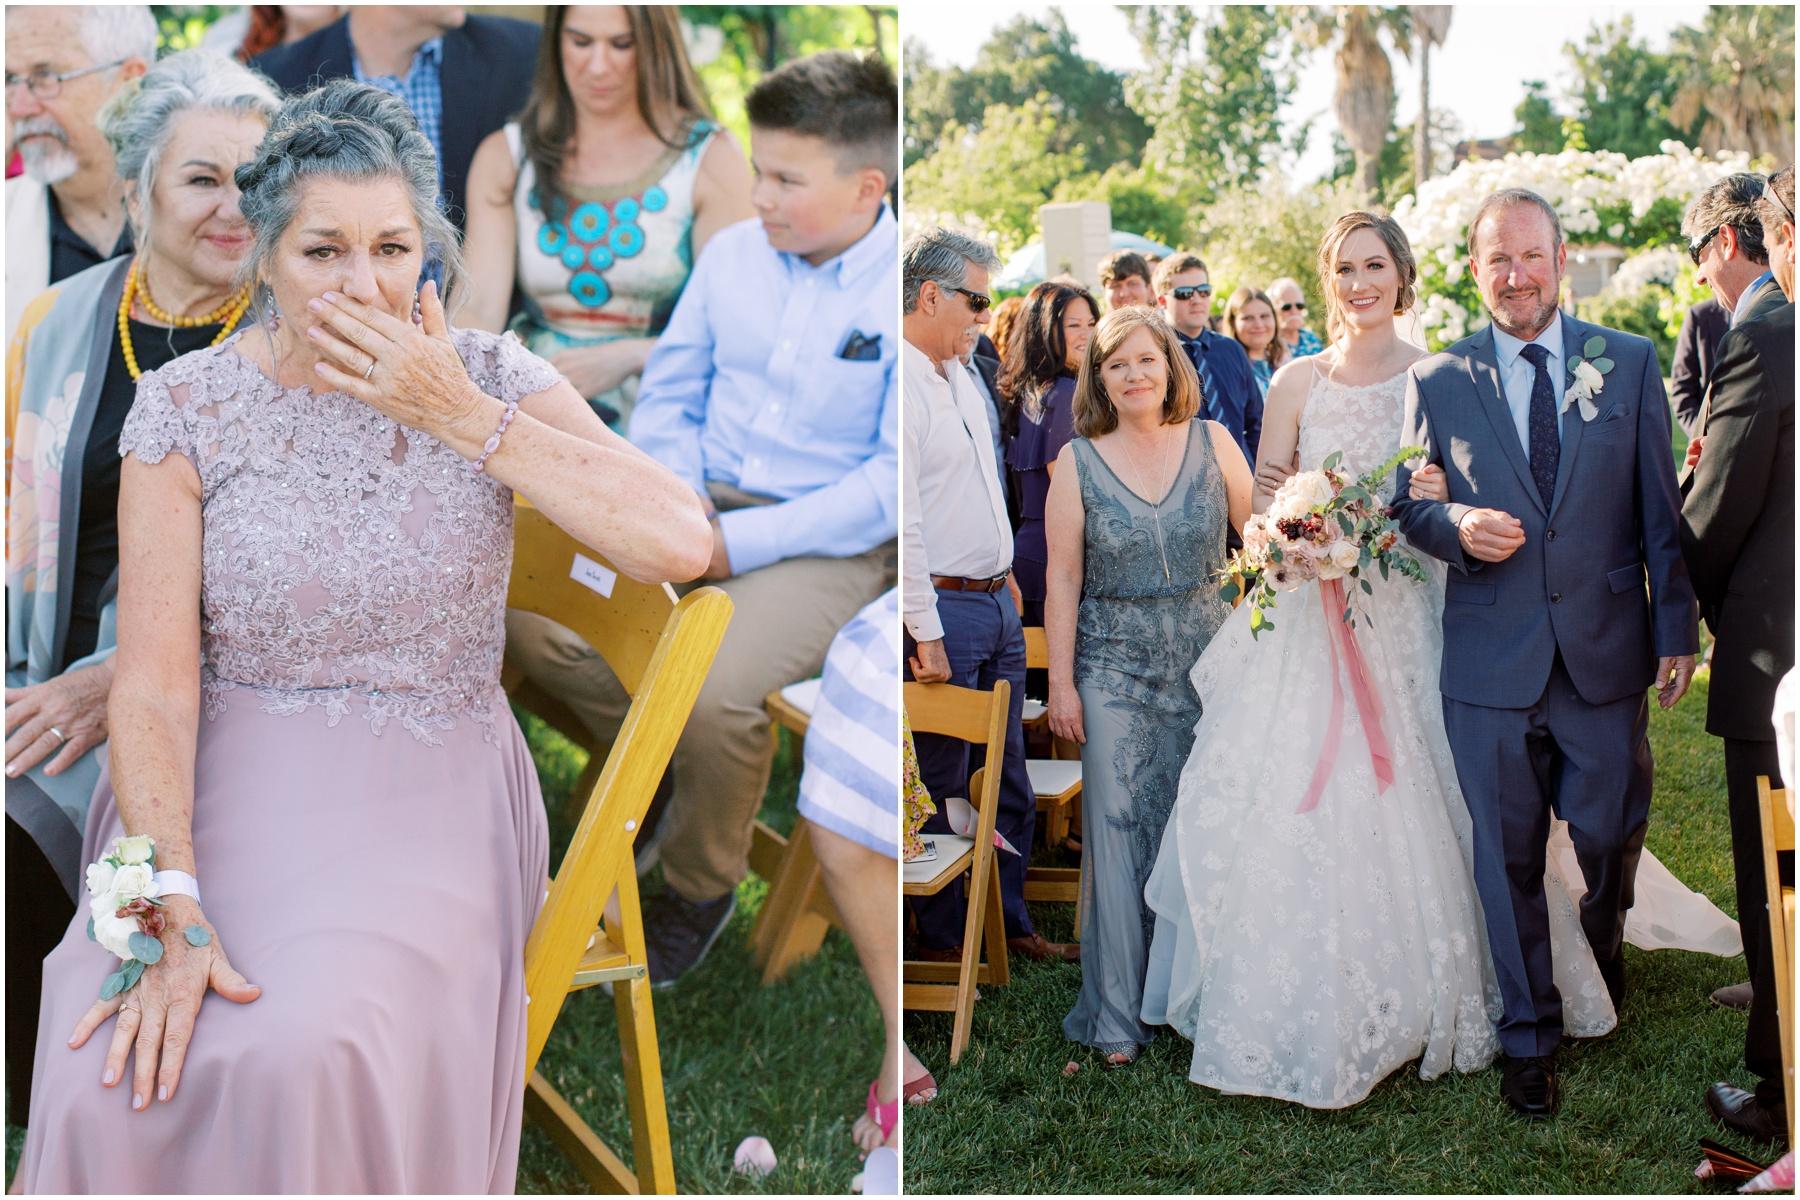 Scribner-bend-vineyards-wedding-sacramento-california-Kristine-Herman-Photography-231.jpg